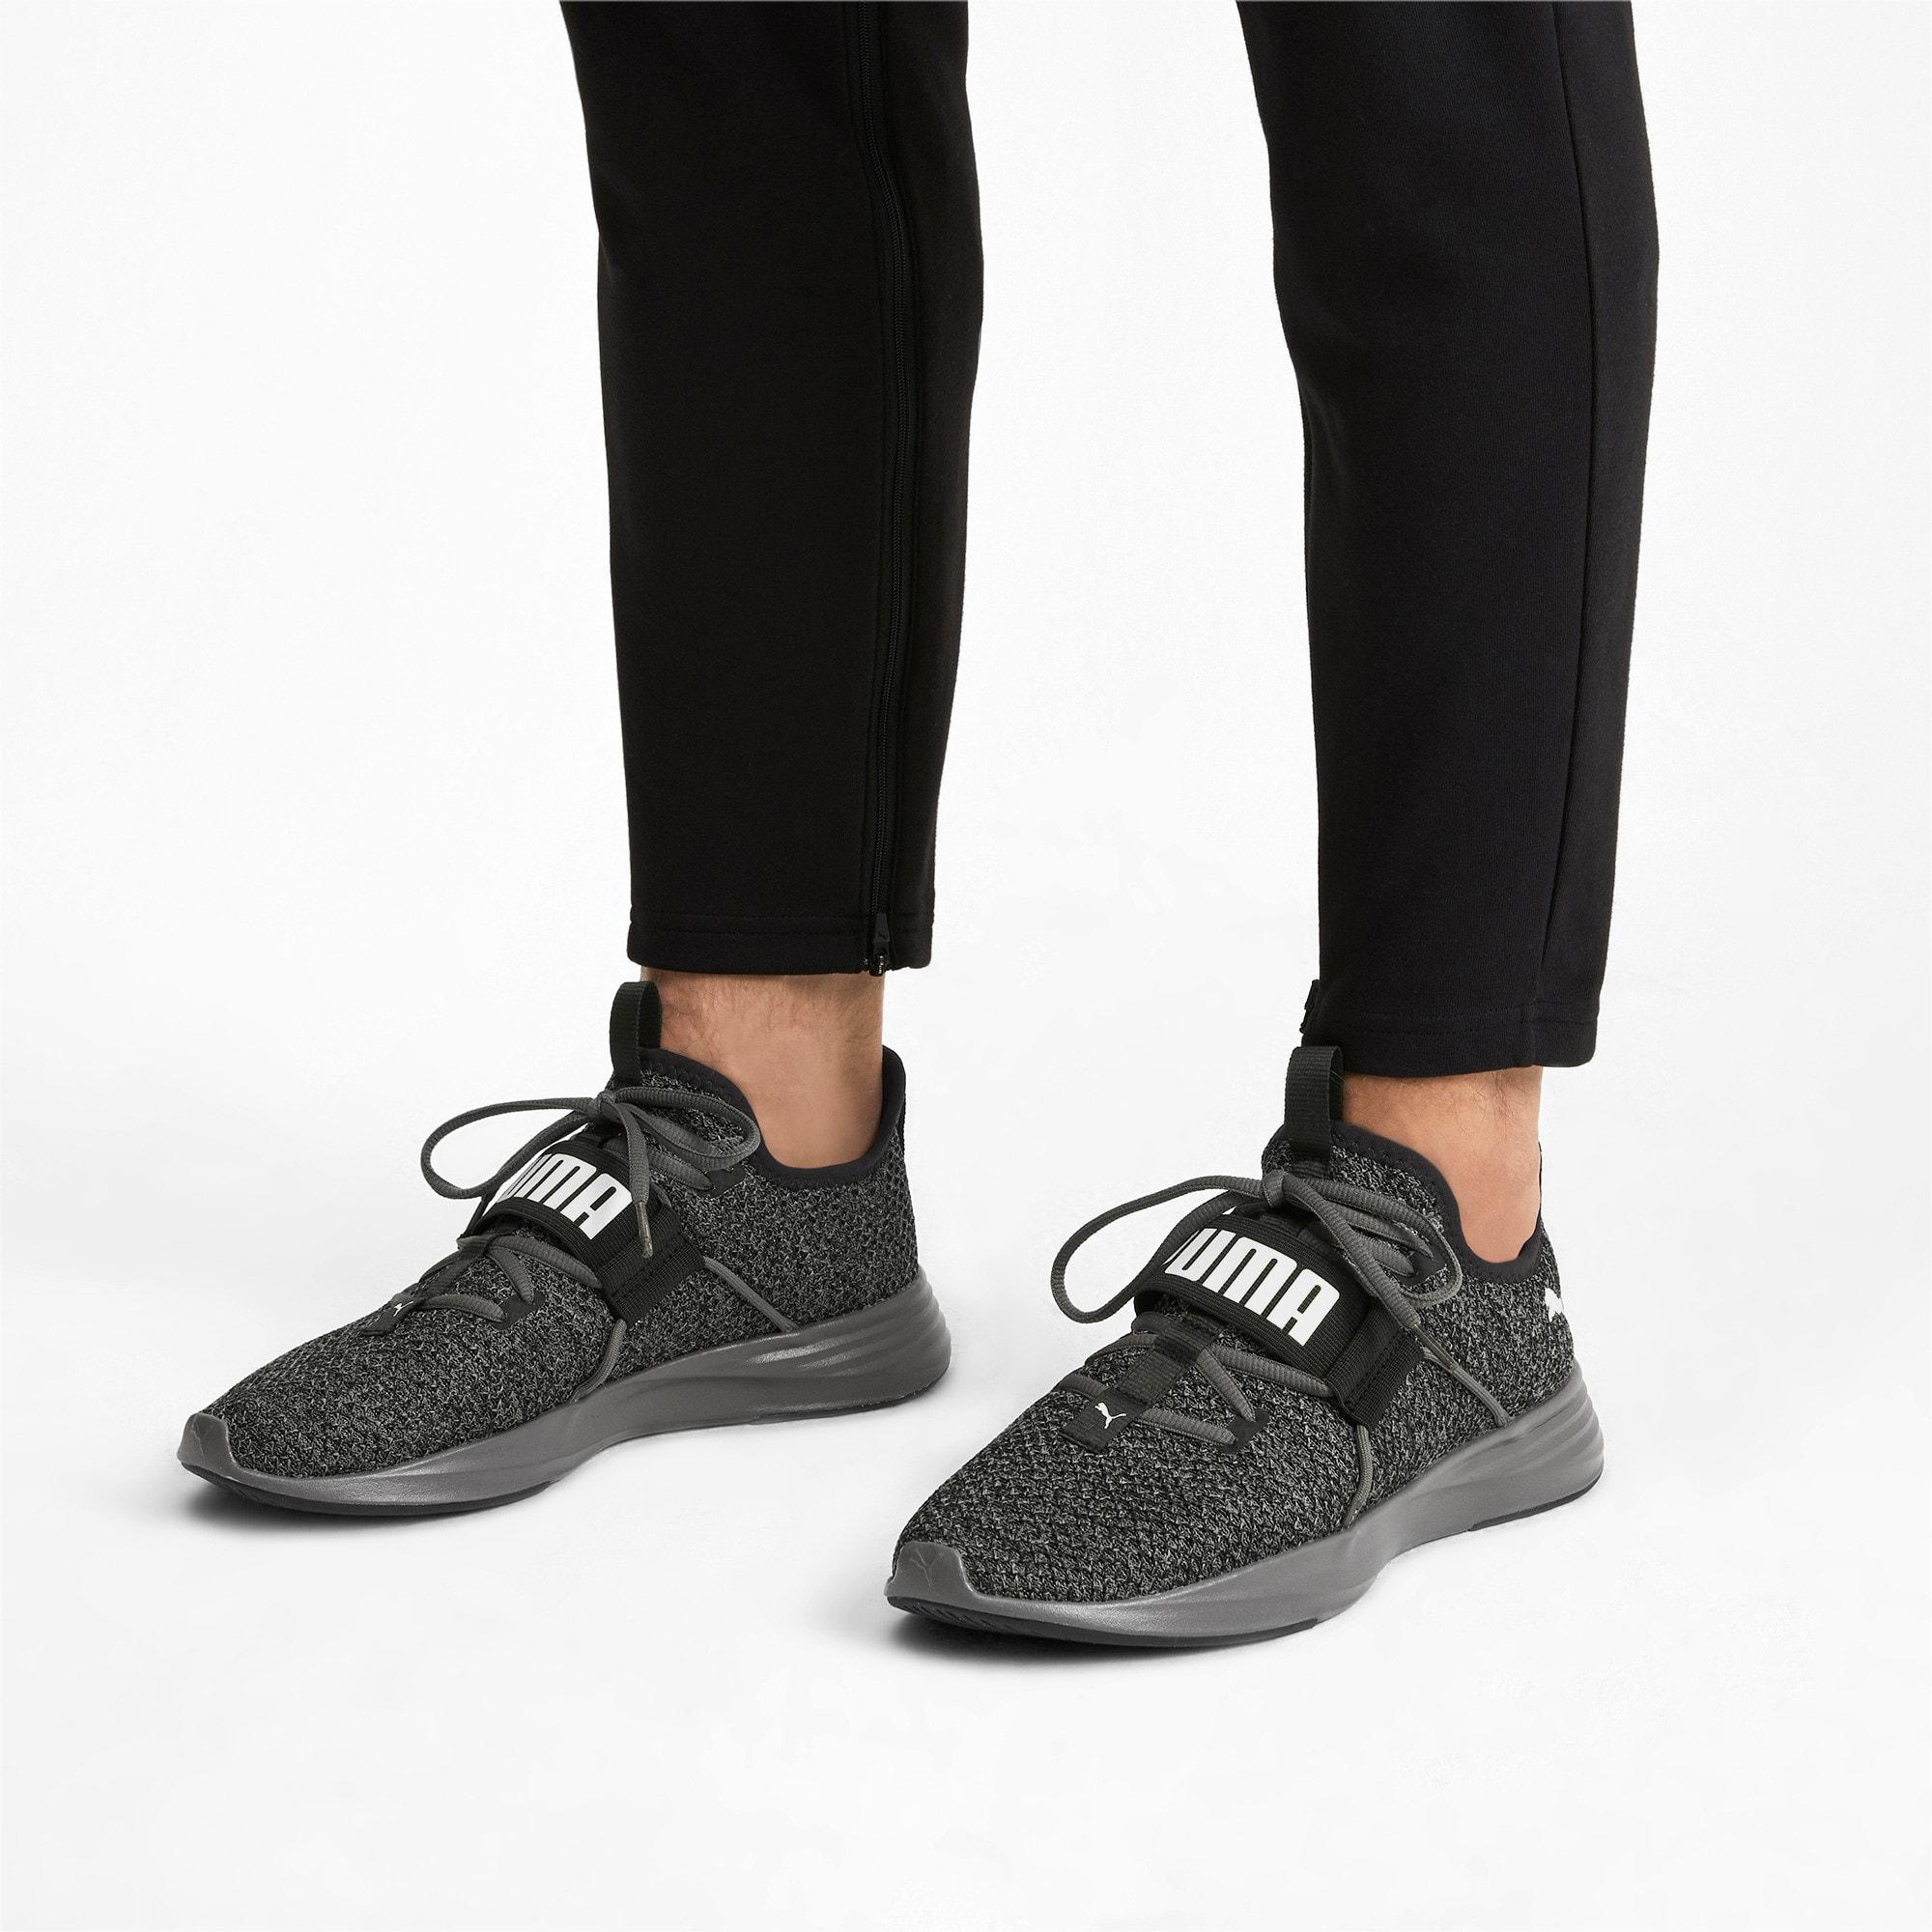 Thumbnail 2 of Persist XT Knit Men's Training Shoes, CASTLEROCK-Puma White, medium